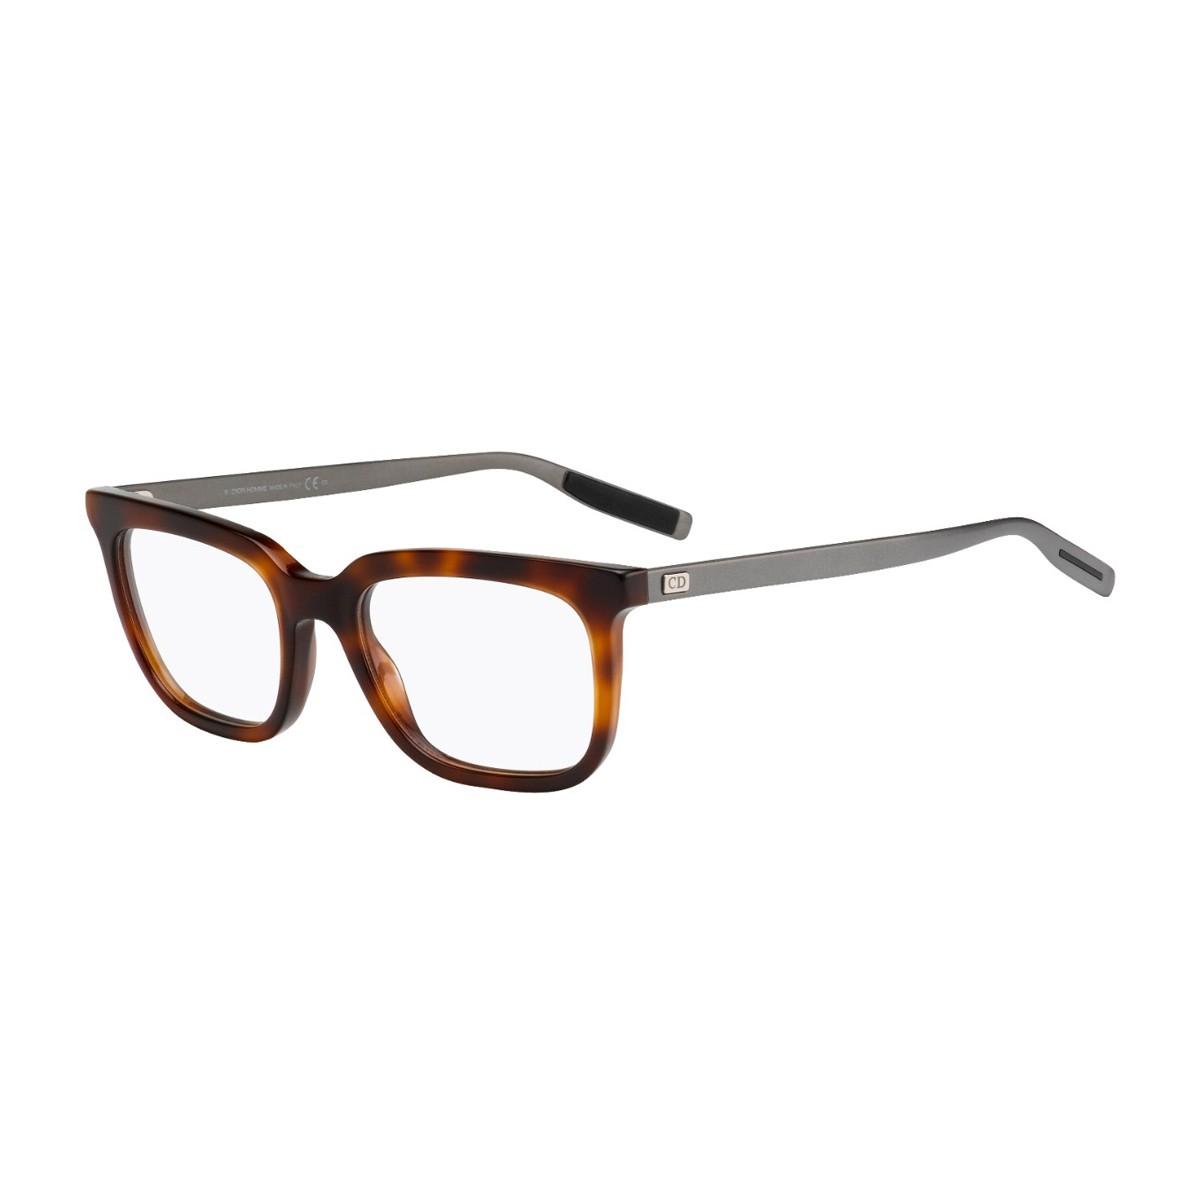 Dior Blacktie 216 | Occhiali da Vista